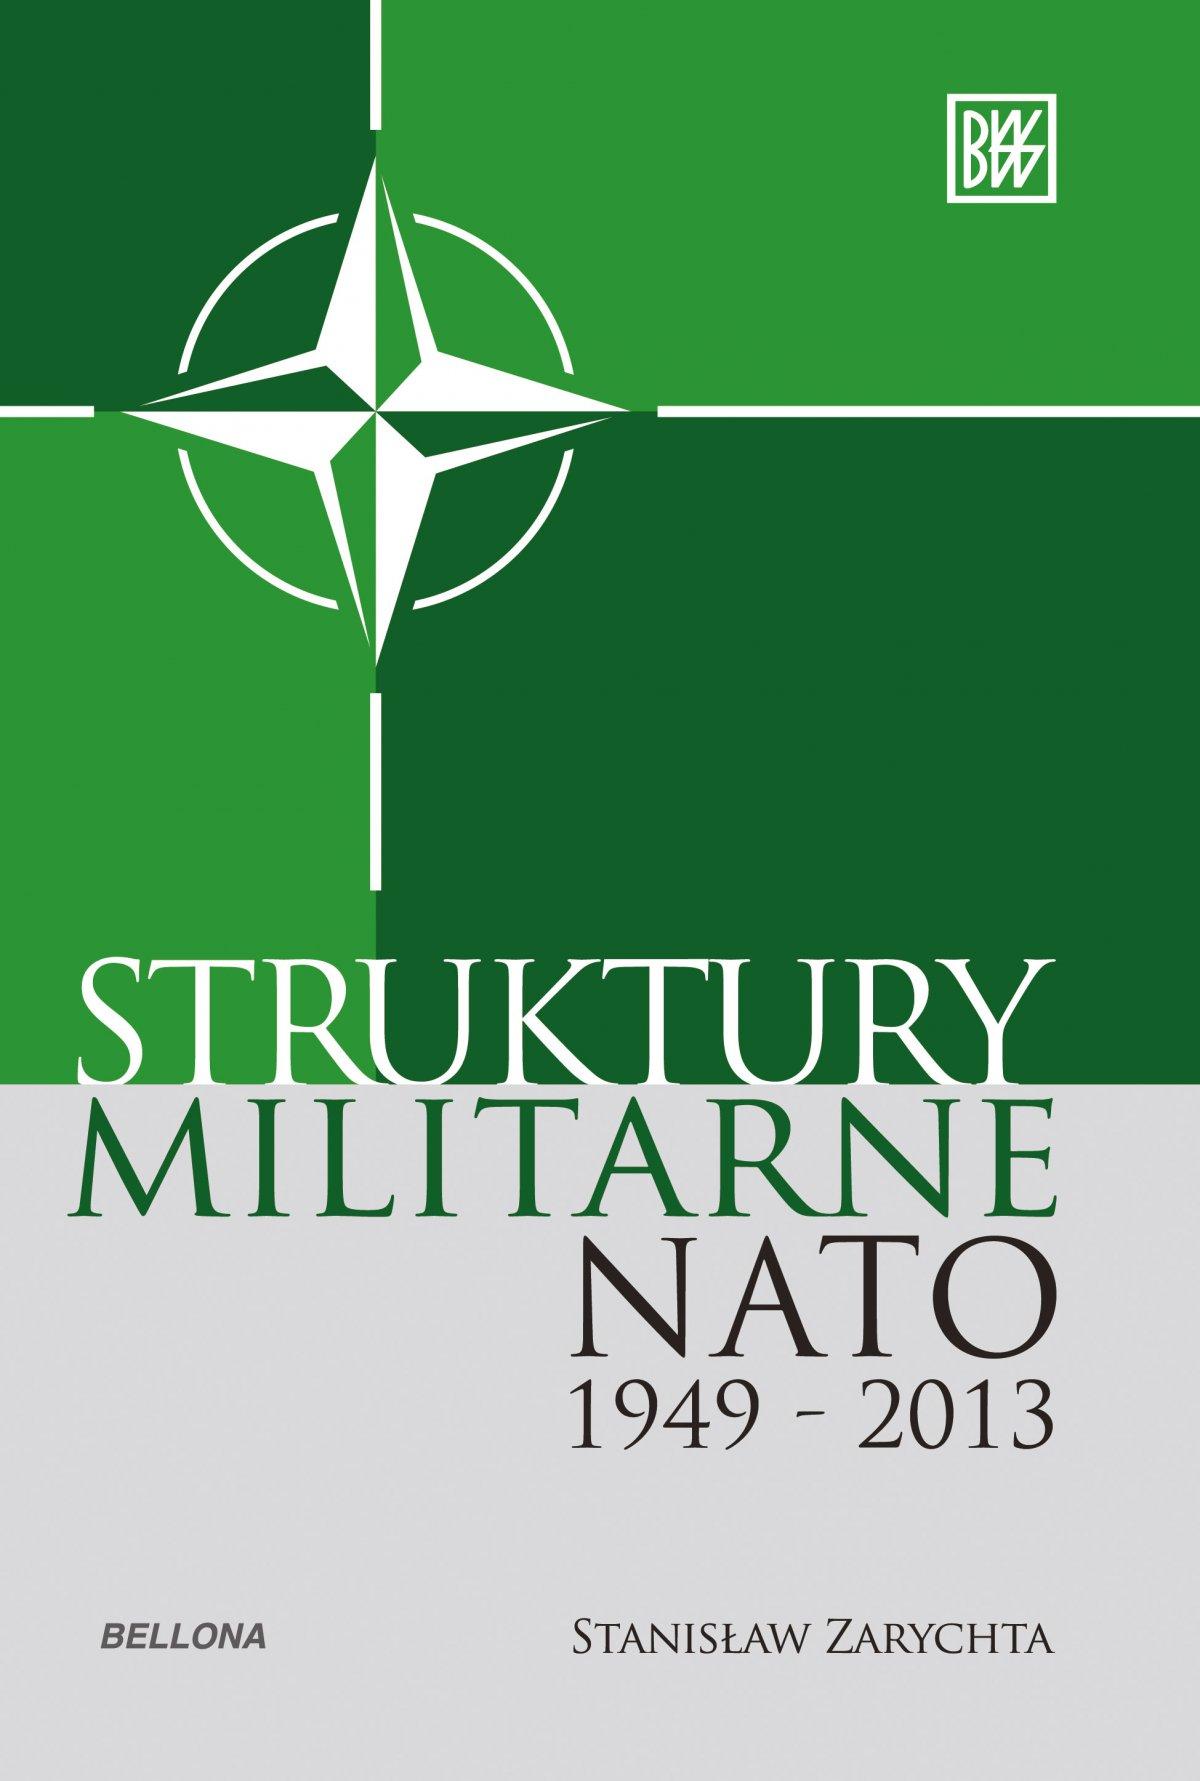 Struktury militarne NATO 1949-2013 - Ebook (Książka EPUB) do pobrania w formacie EPUB